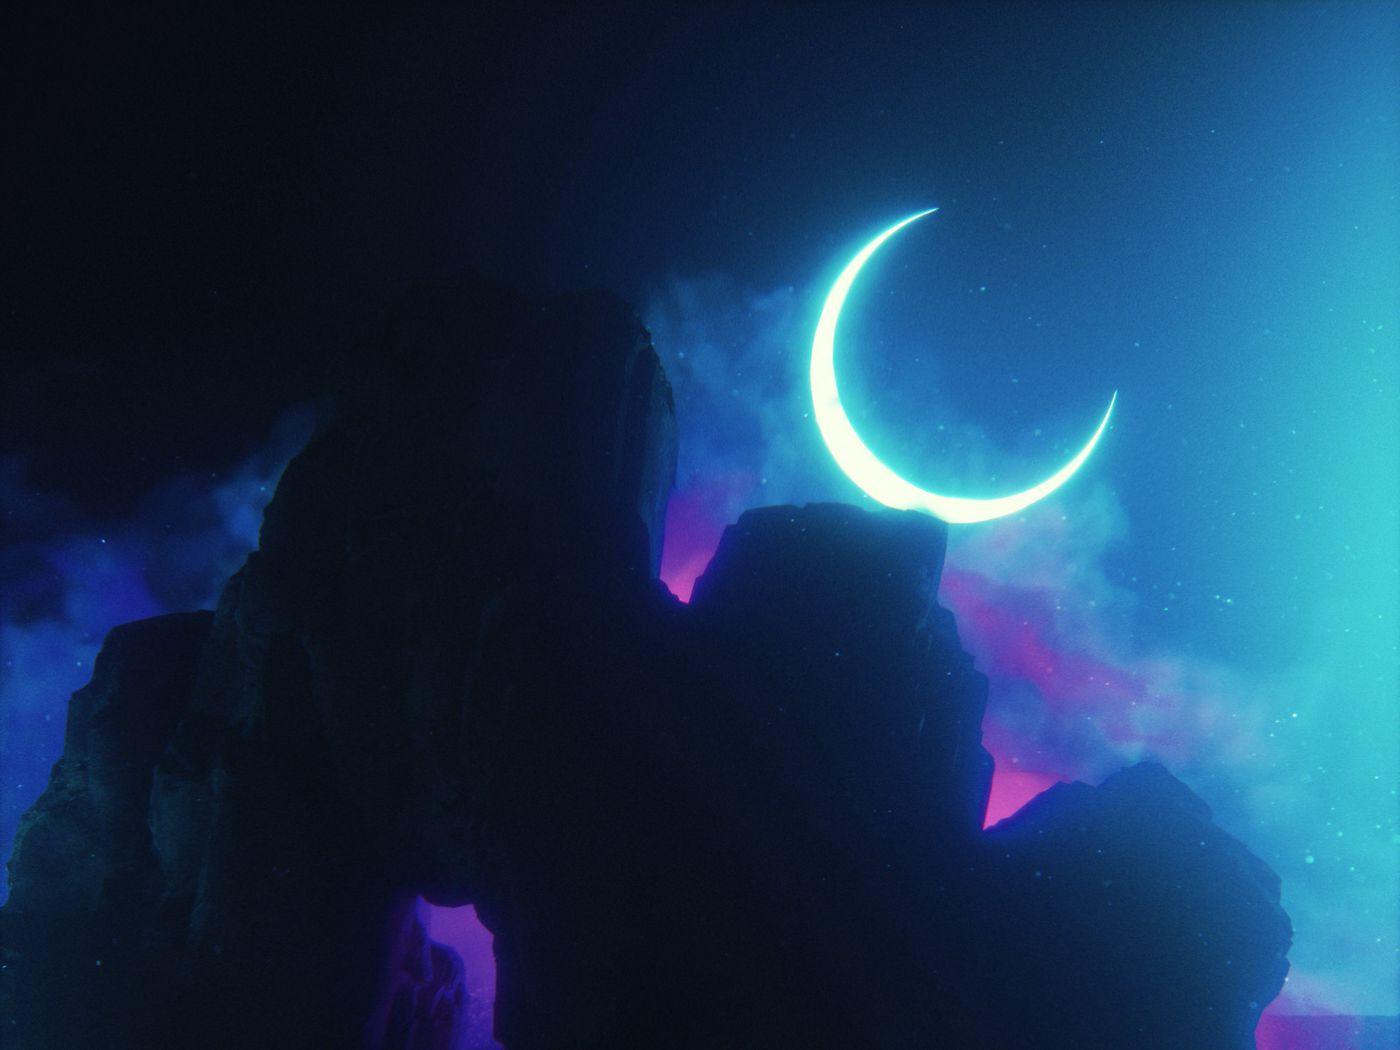 1400x1050 Wallpaper rock, neon, smoke, moon, light, bright